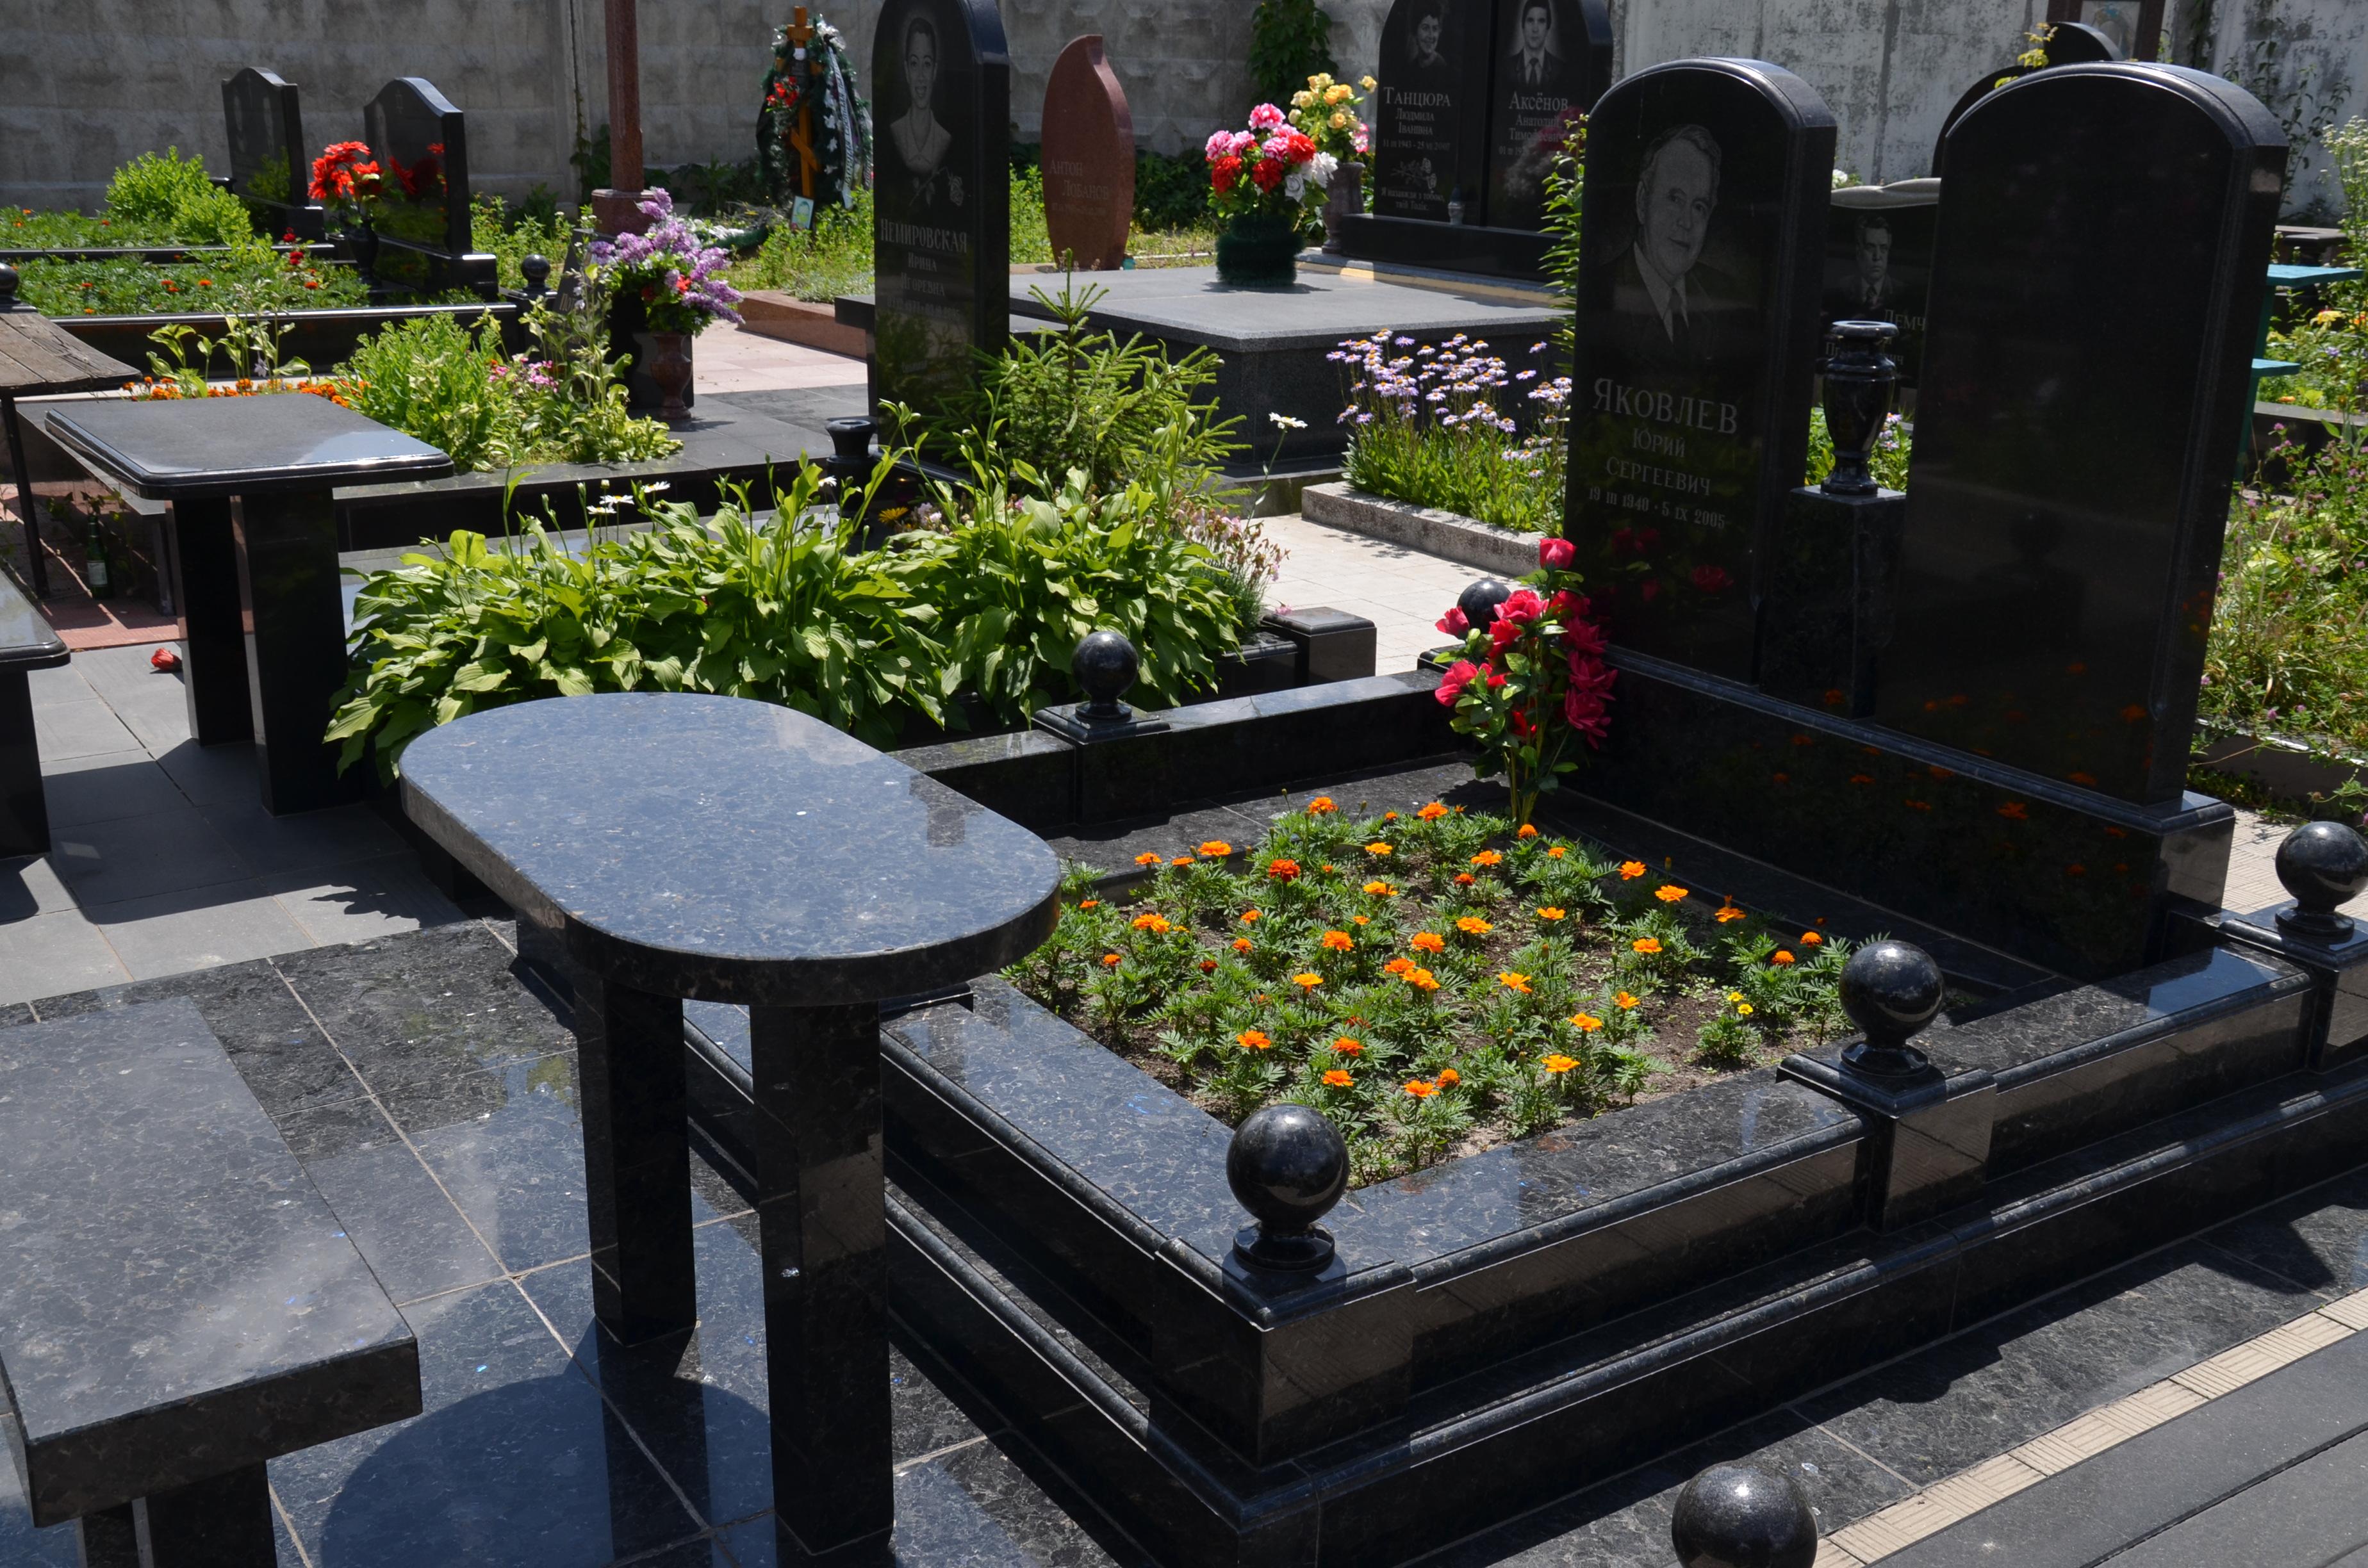 подача фотографии надгробий в узбекистане голубого кота можно